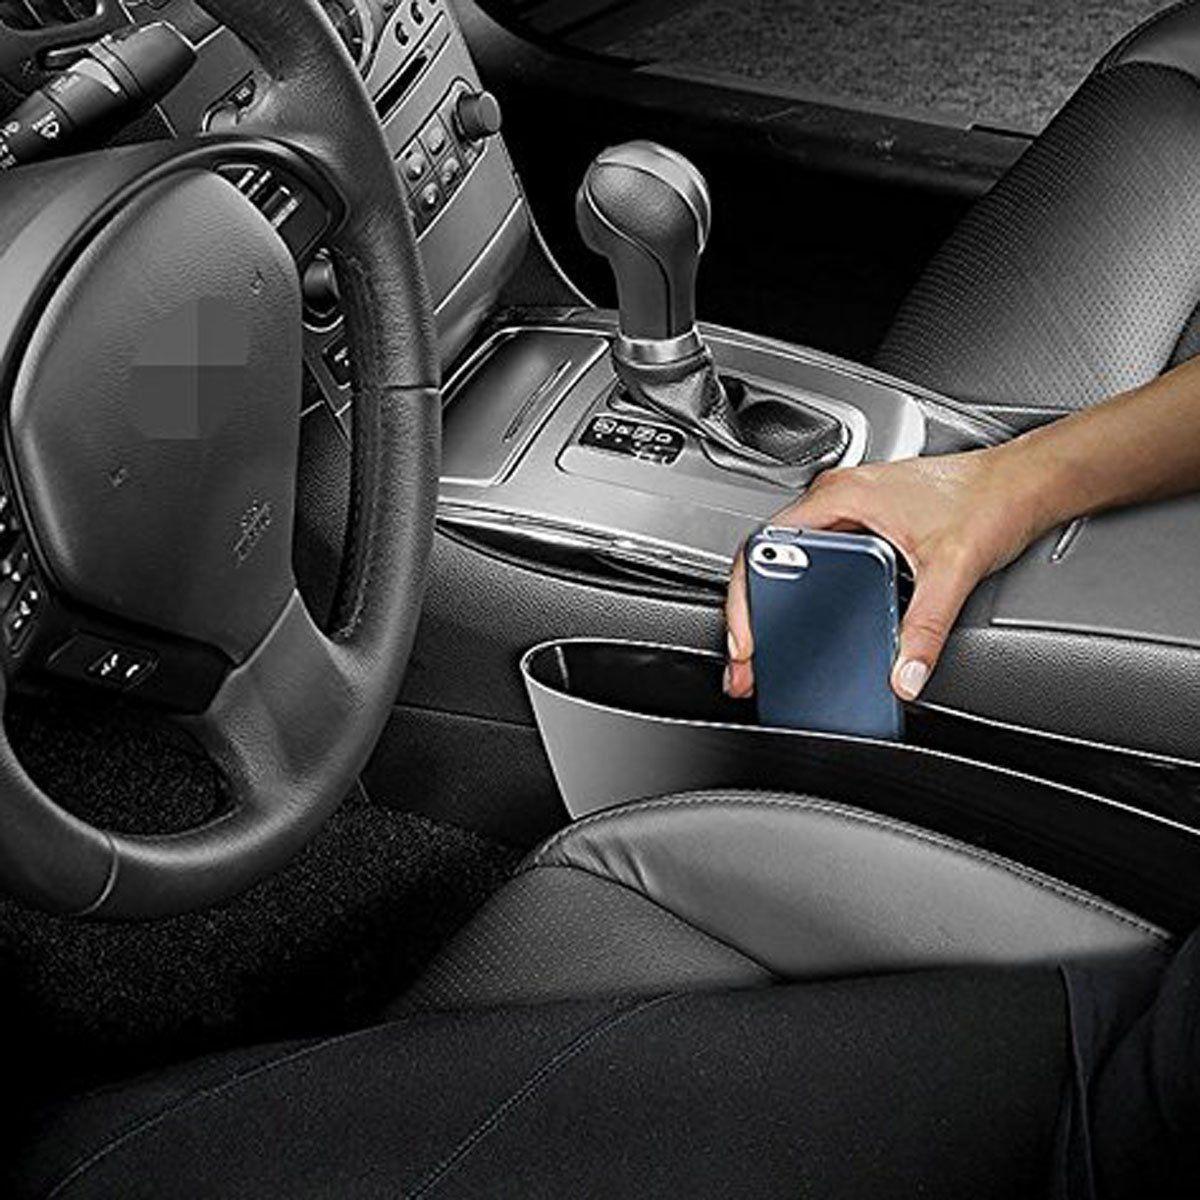 US 8.19 New in eBay Motors, Parts & Accessories, Car